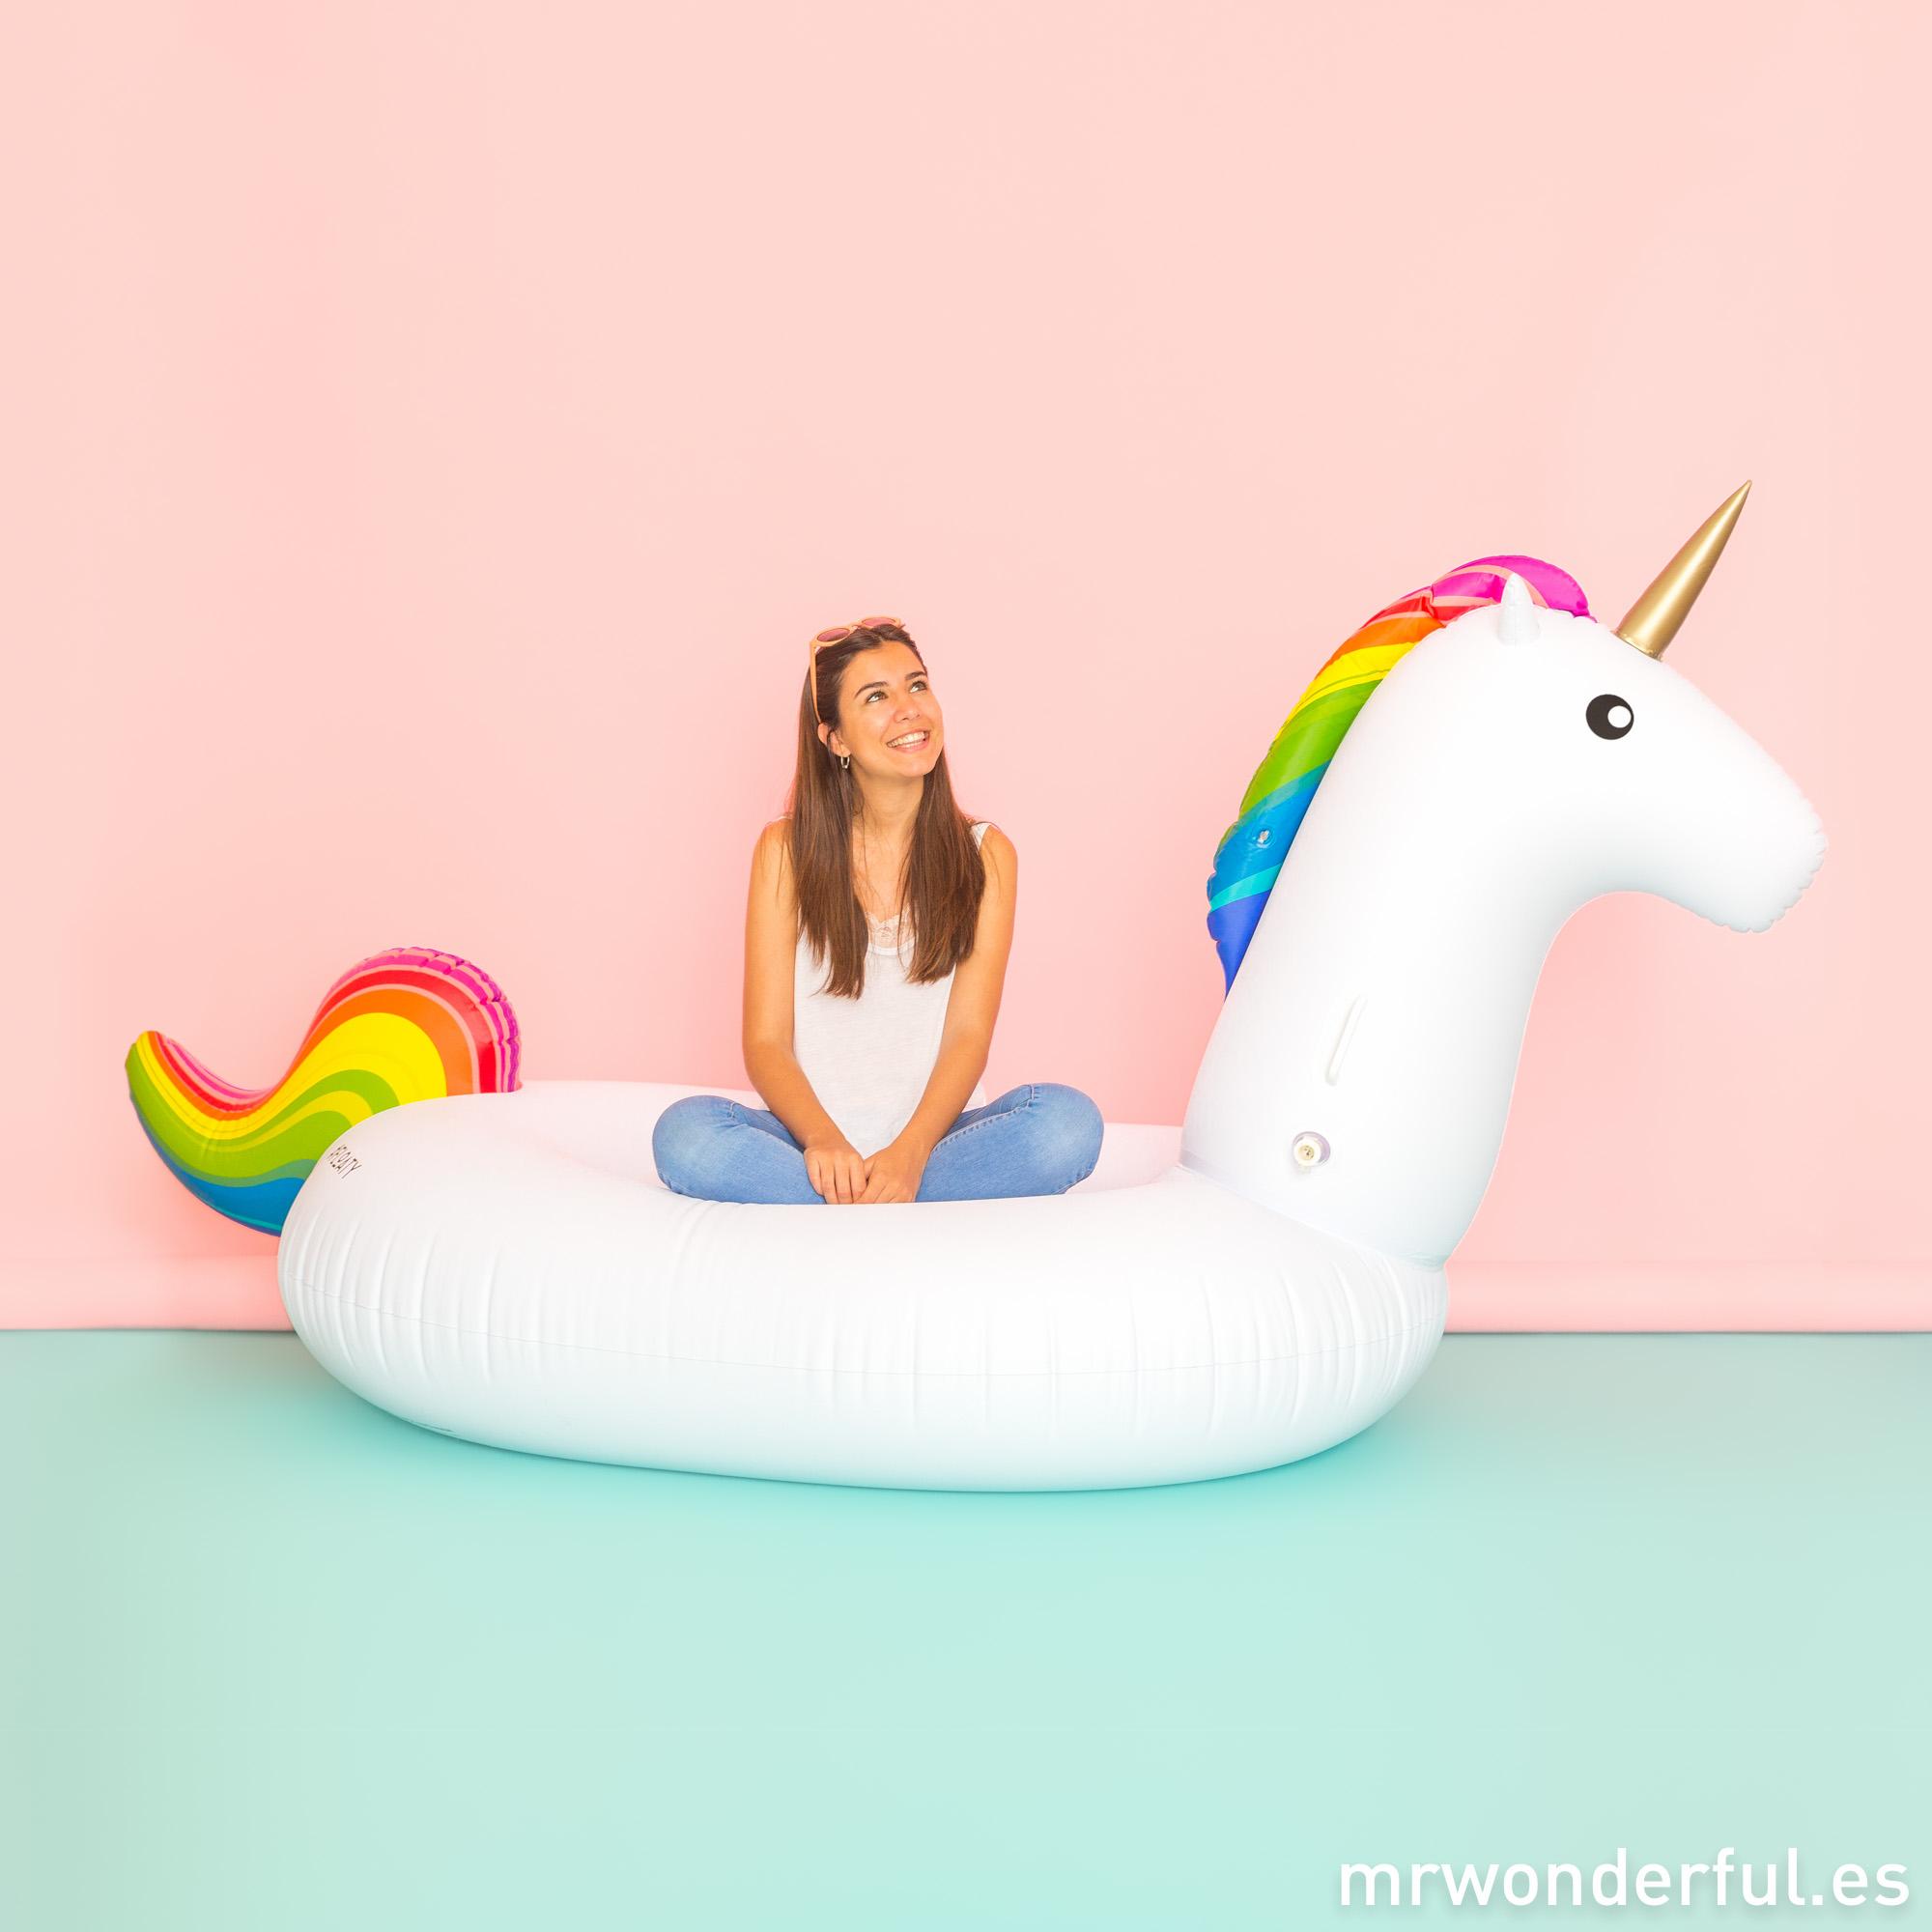 mrwonderful_ PRA02961UN_Flotador-unicornio-05